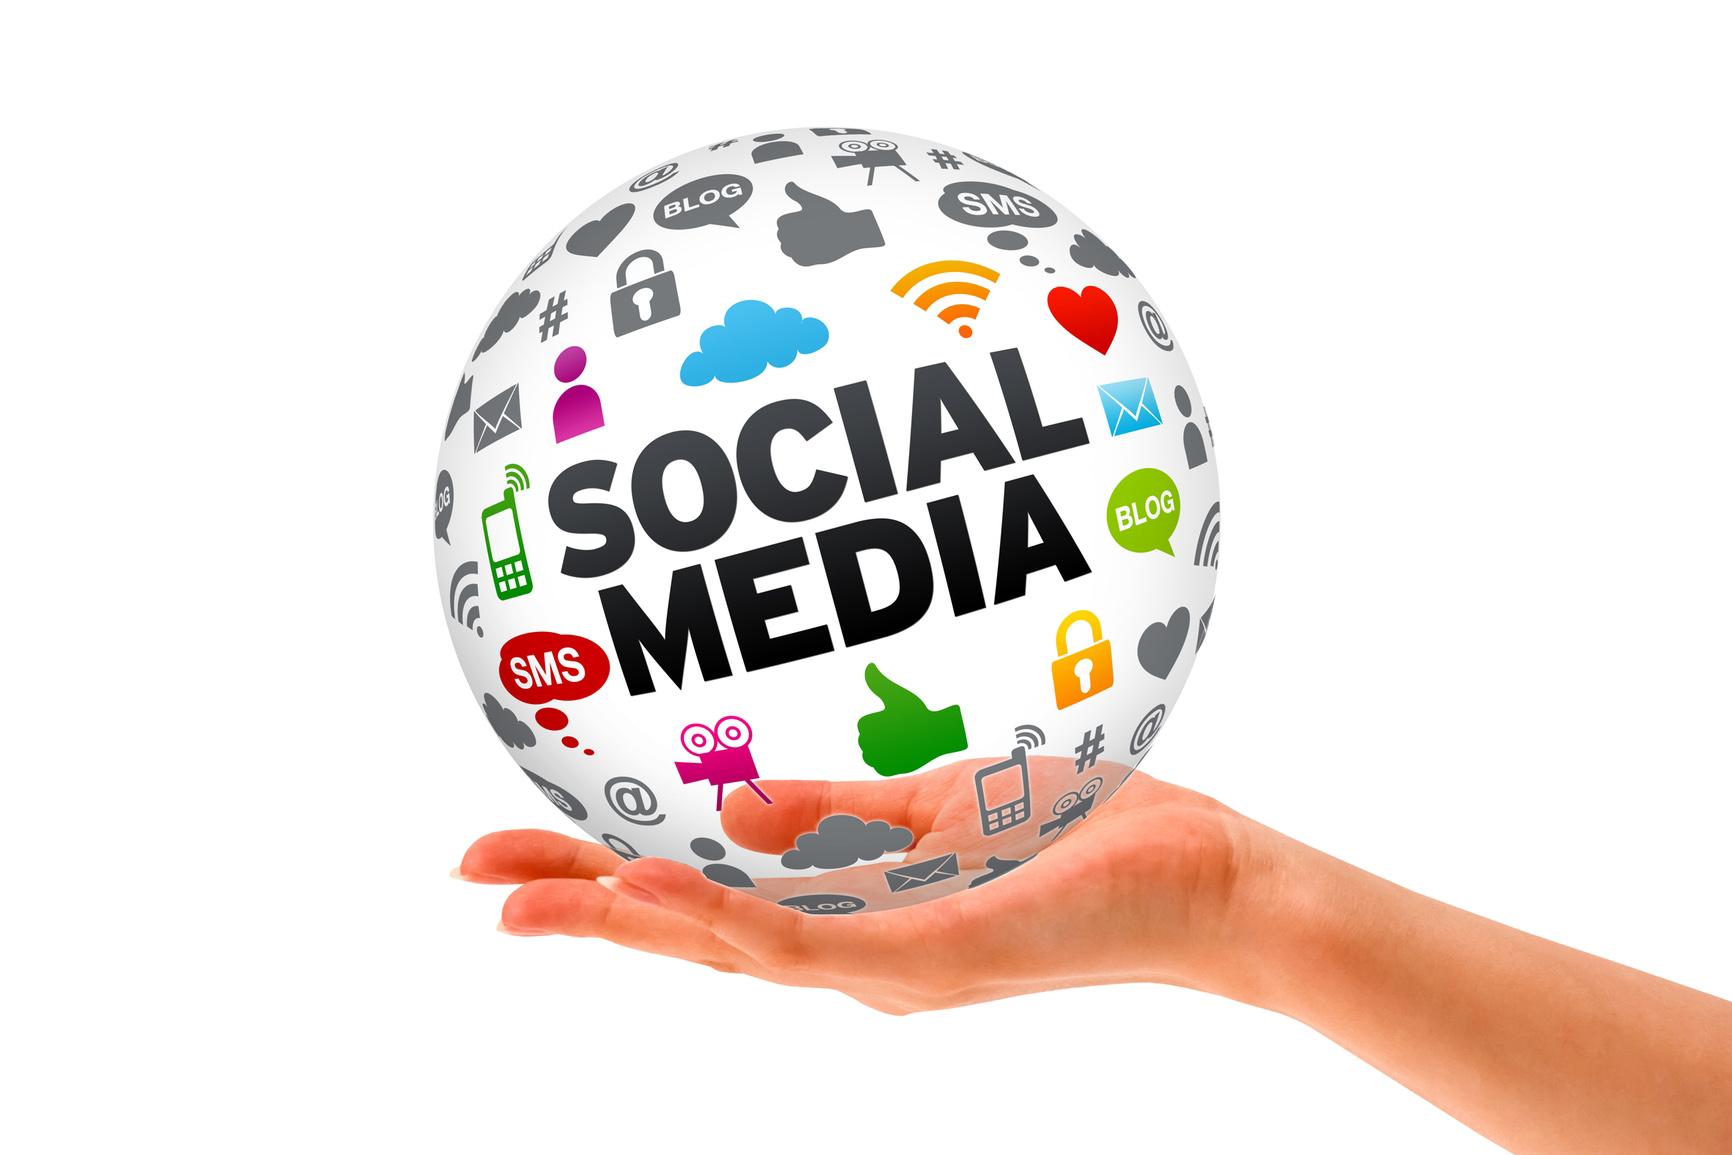 Merging Social Media With Real Life Marketing